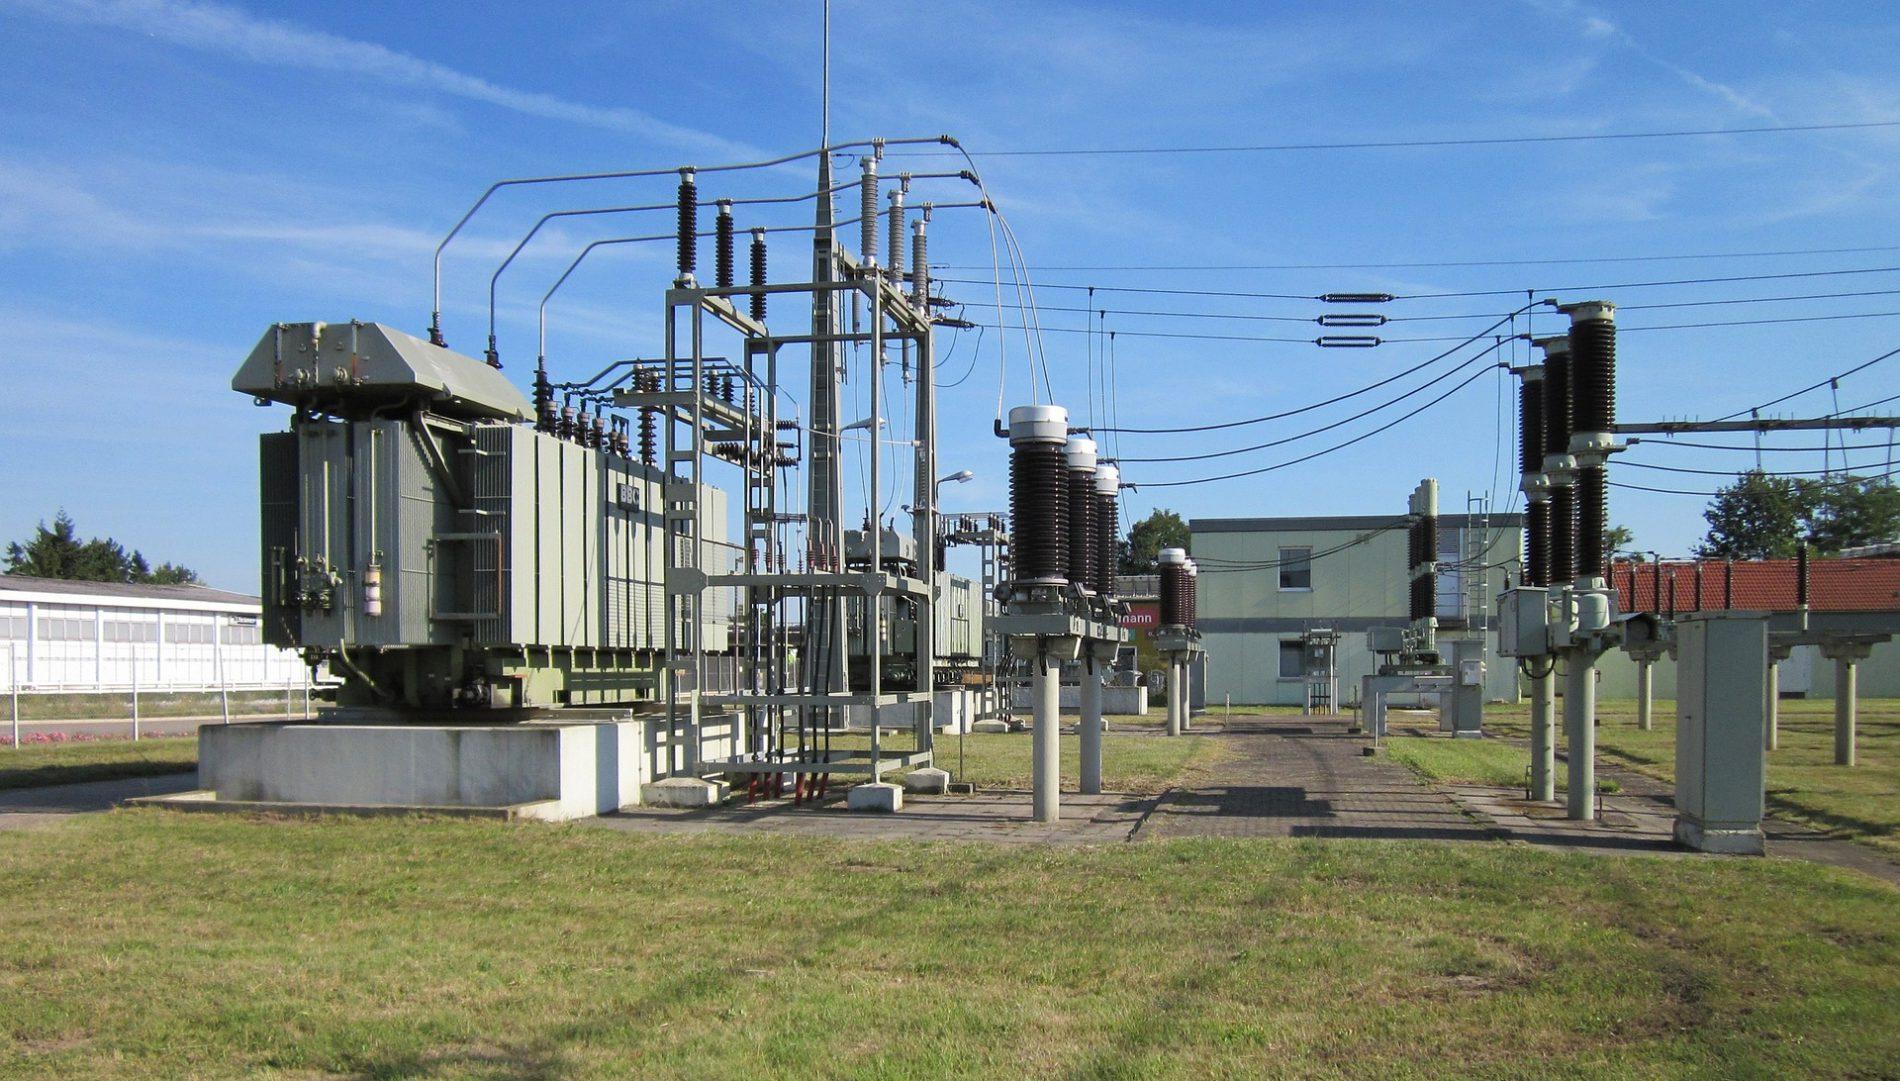 Nik-San Engineering Co Pvt Ltd